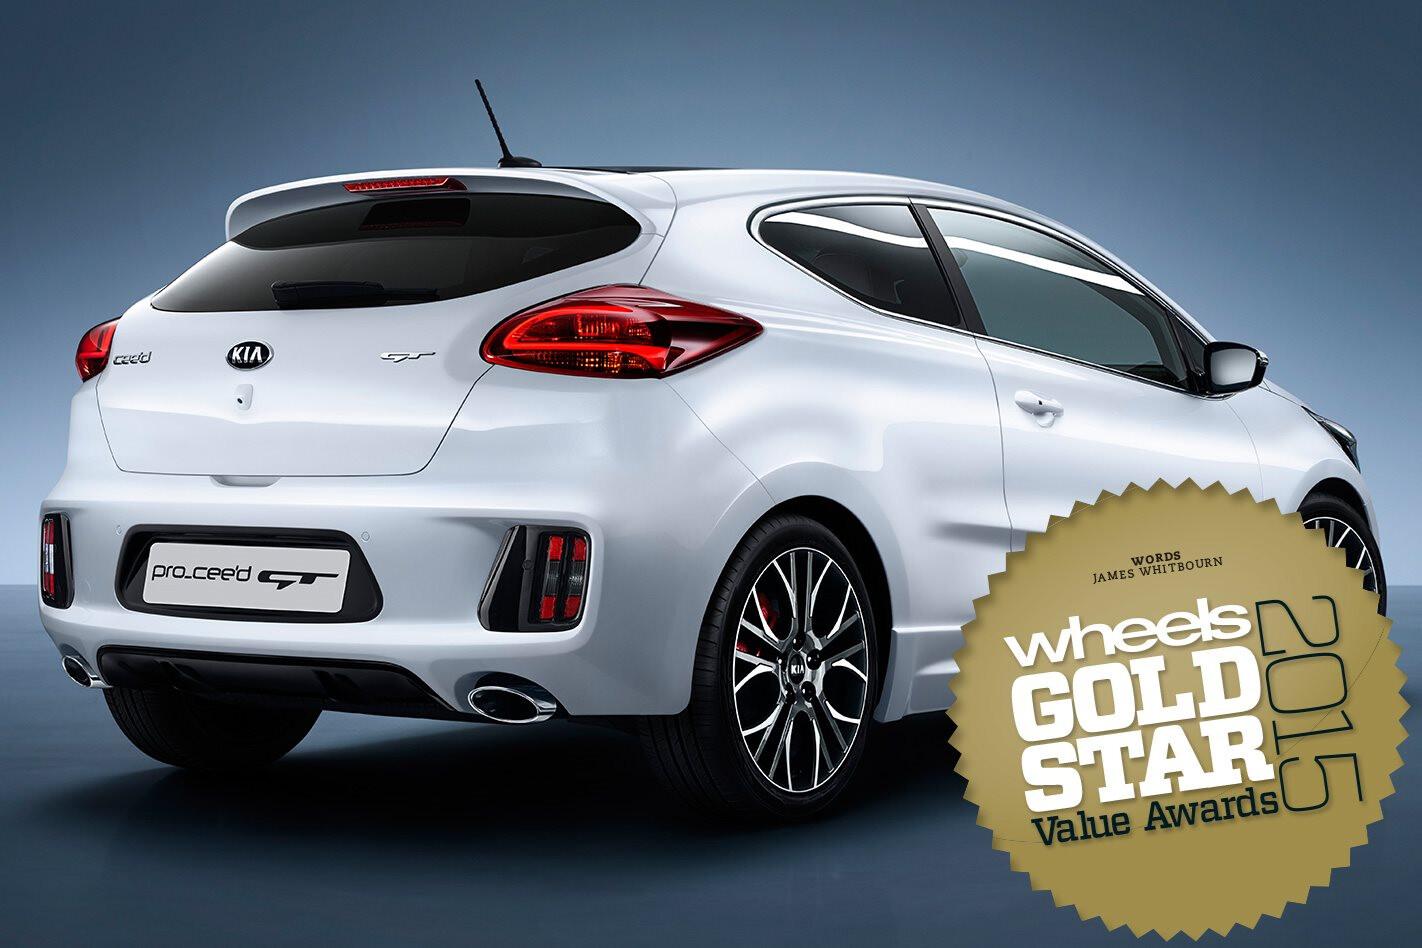 Performance Cars under $75K: Gold Star Value Awards 2015